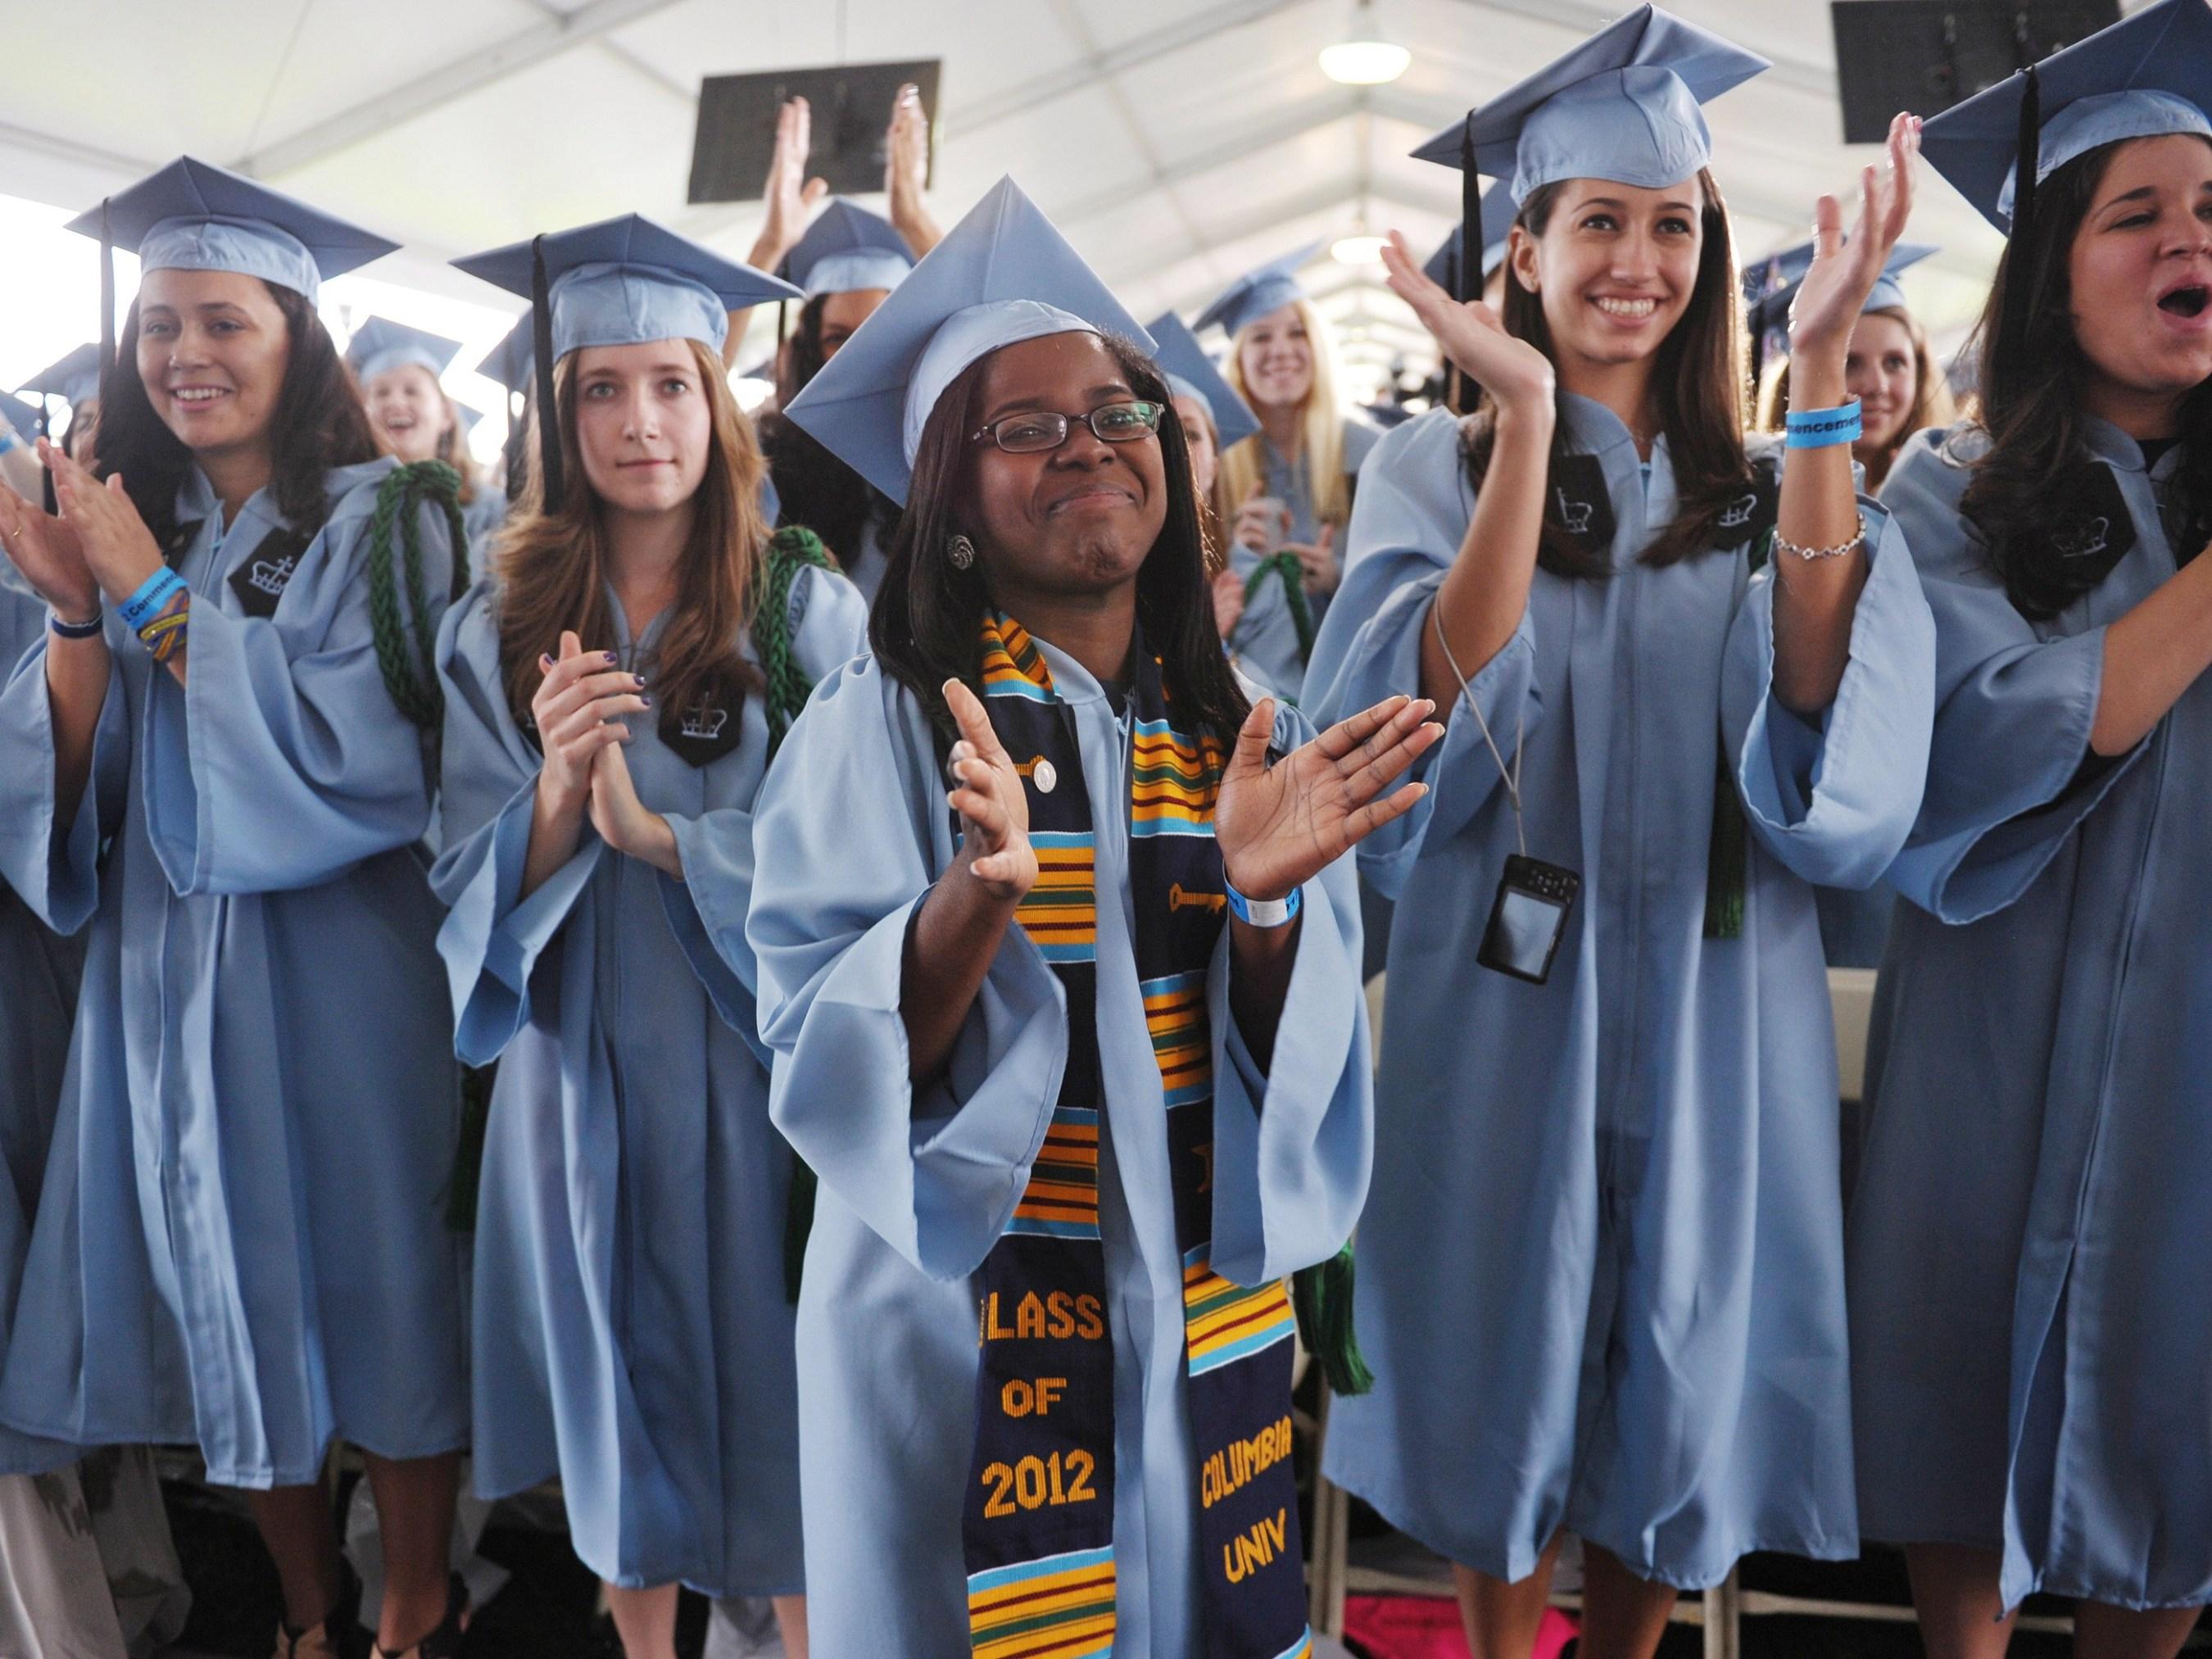 f37676604a Race Gap Narrows in College Enrollment